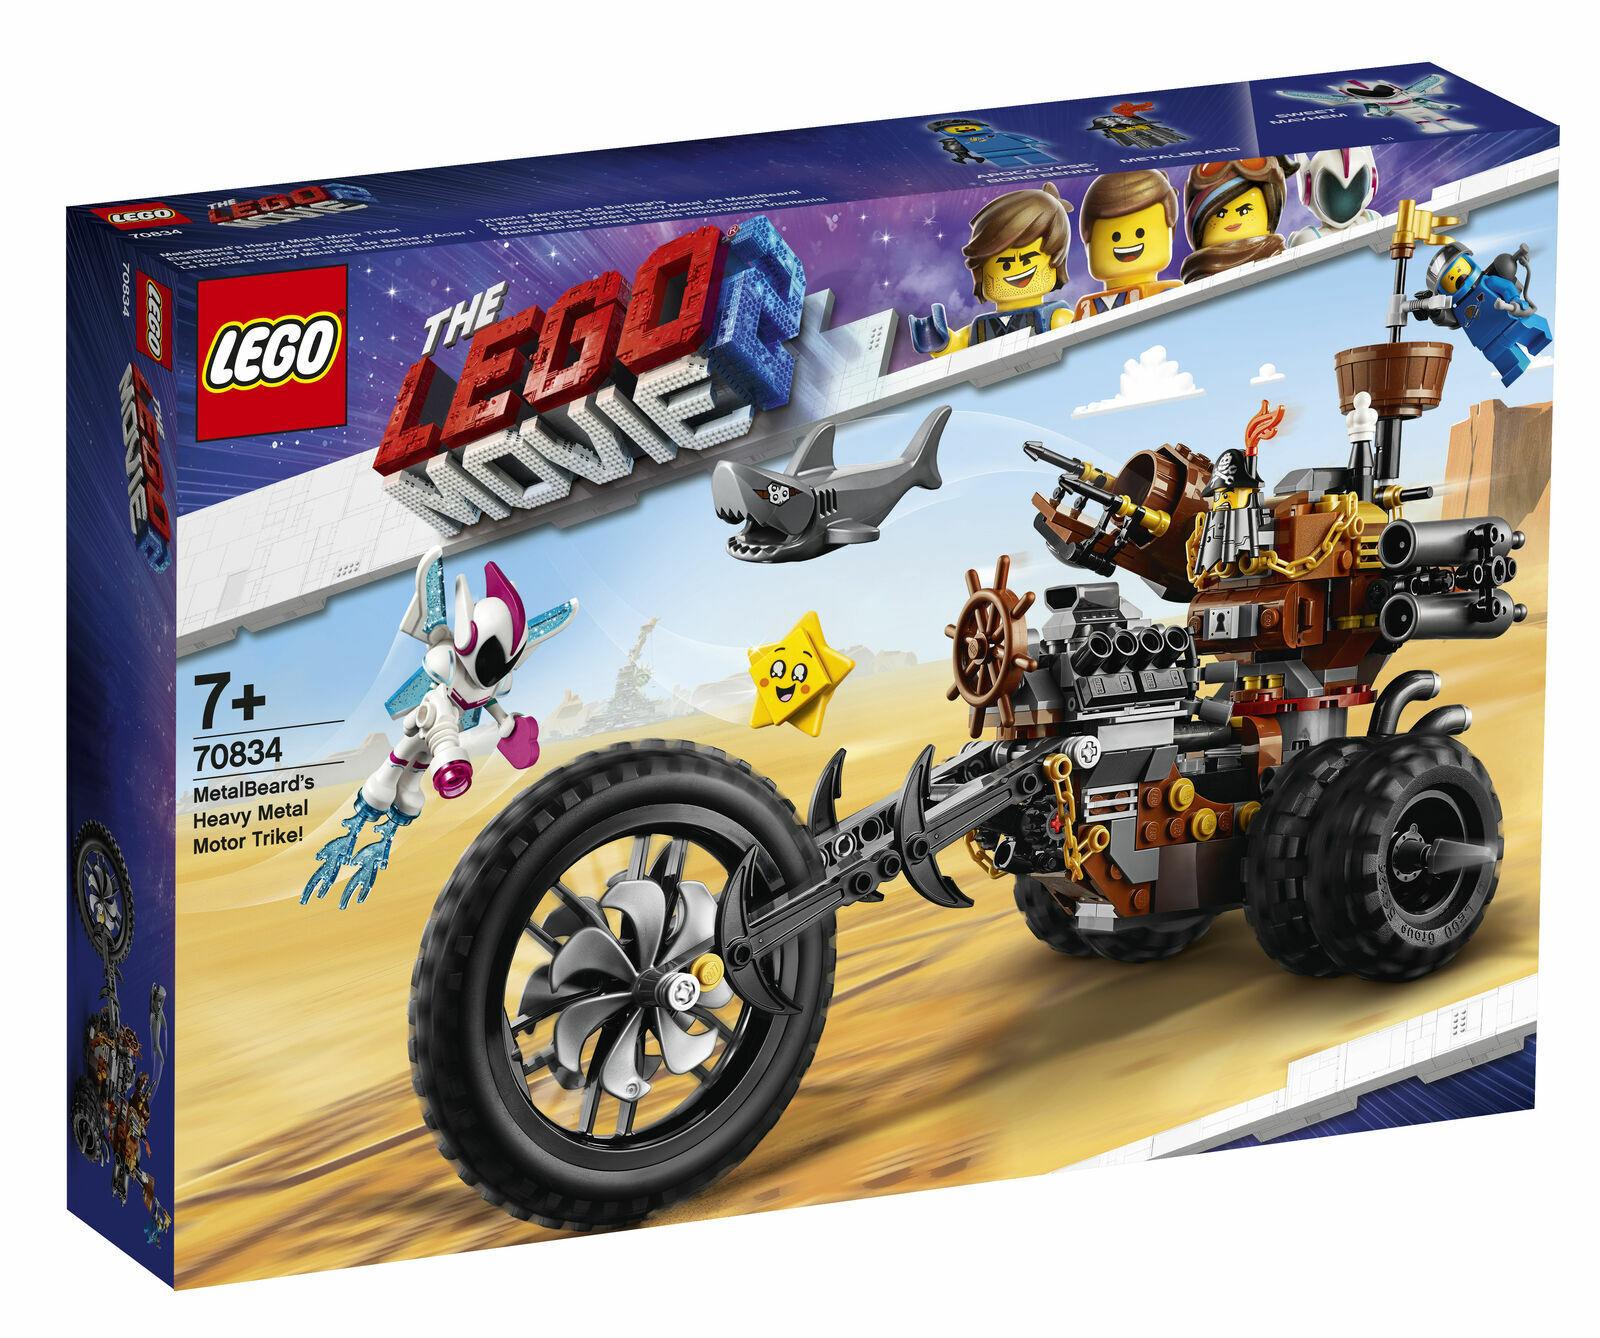 LEGO Metalorsod's  Heavy Metal Motor Trike Set (70834)  presa